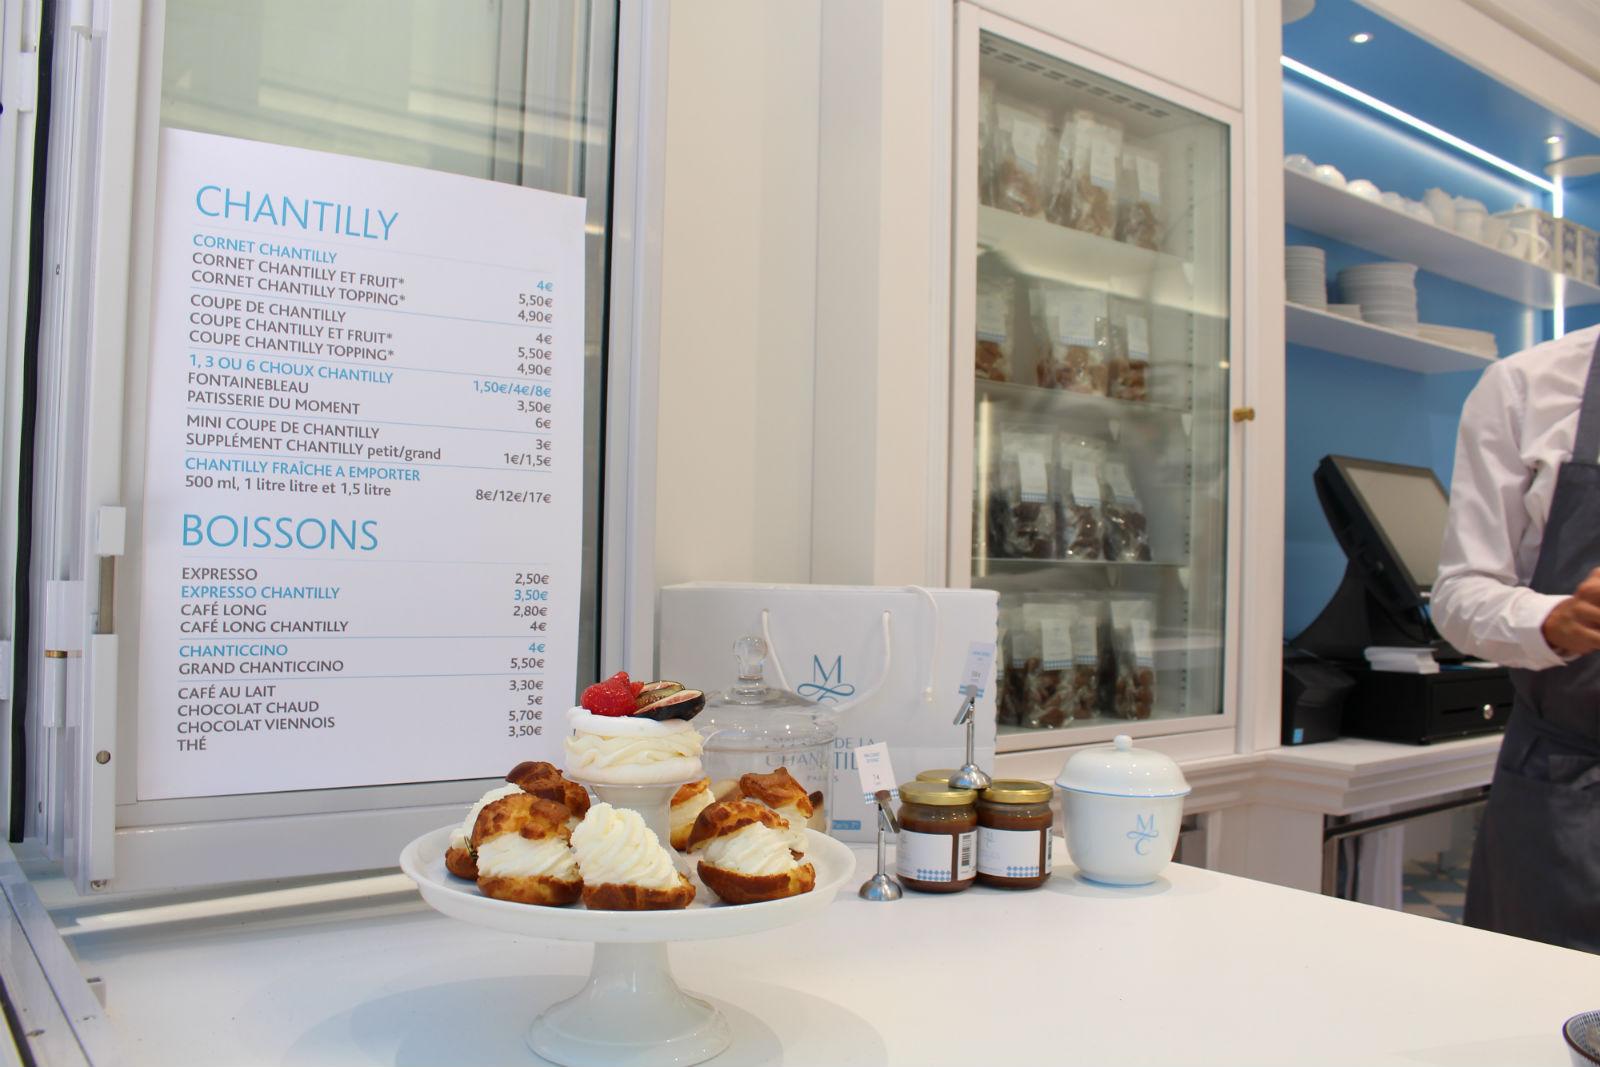 HiP Paris blog. Maison de la Chantilly. Stacks of decadent pastries in the window